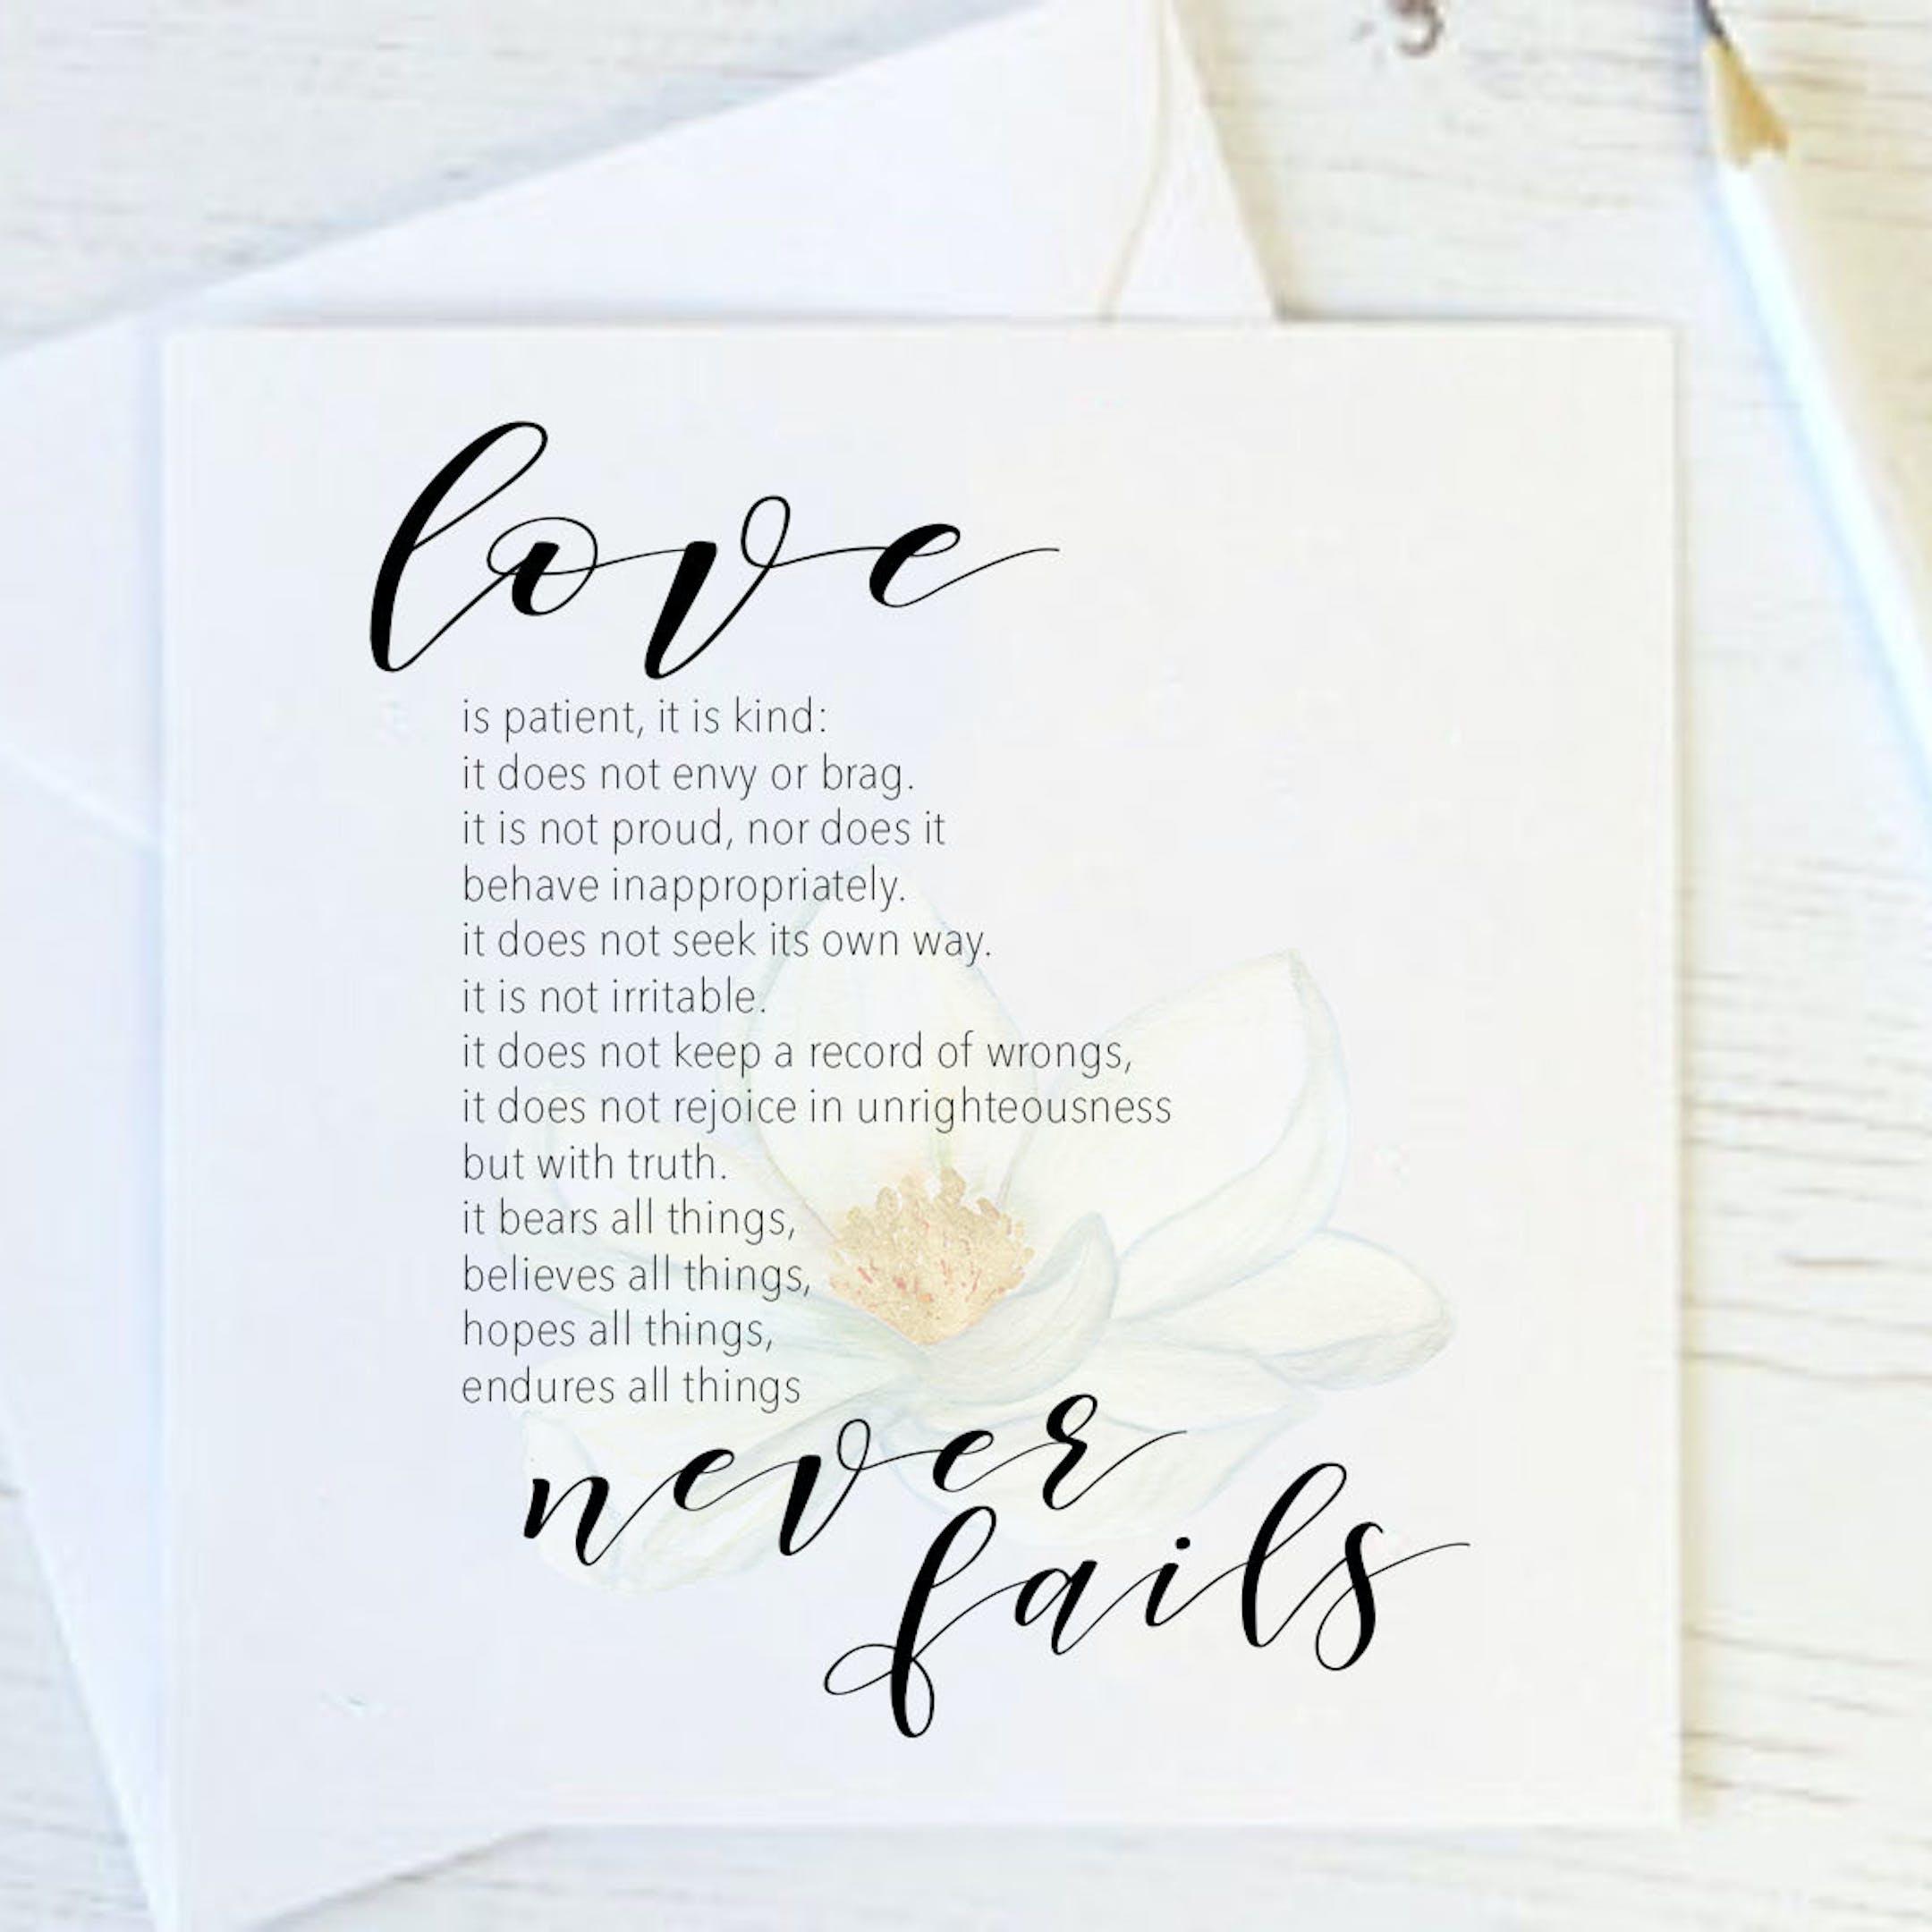 Love Never Fails Floral Card - 1 Corinthians 13:4-8 - Christian Lettering Company